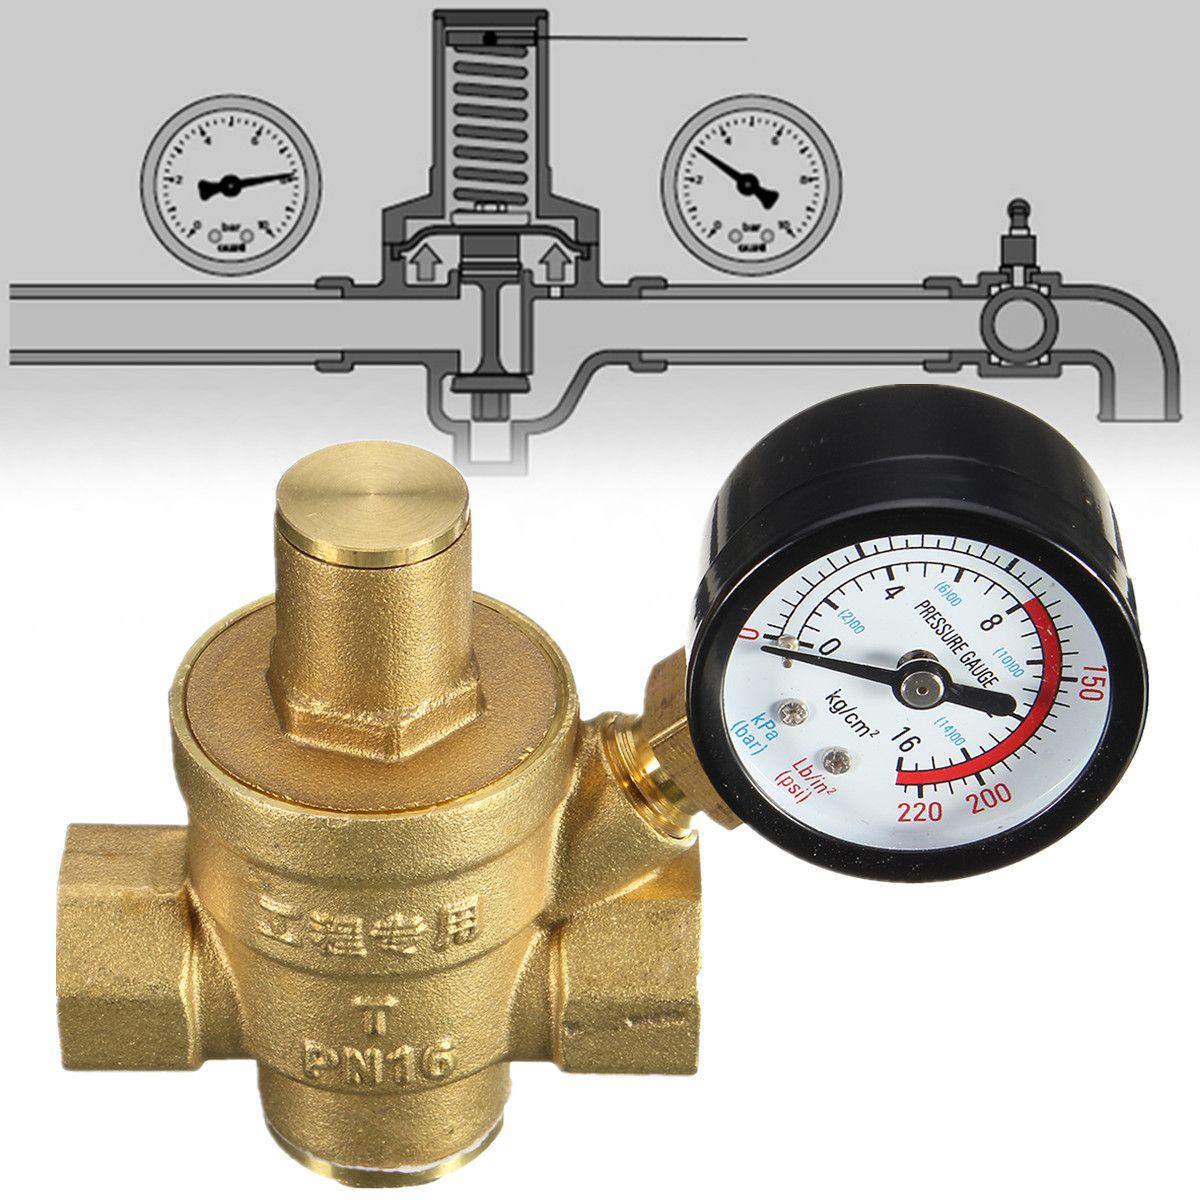 DN15 NPT 1/2'' Brass Water Pressure Regulator Reducer Adjustable With Gauge Meter w/ Gauge Meter for Hydraulic Instability/Water